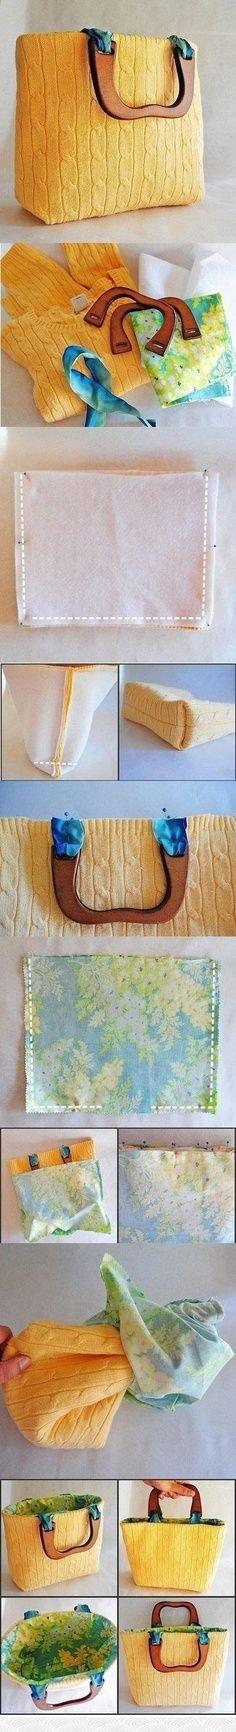 DIY Handbag crafts craft ideas easy crafts diy ideas diy crafts easy diy fun diy craft fashion fashion diy diy accessories craft purse craft accessories diy hand bag